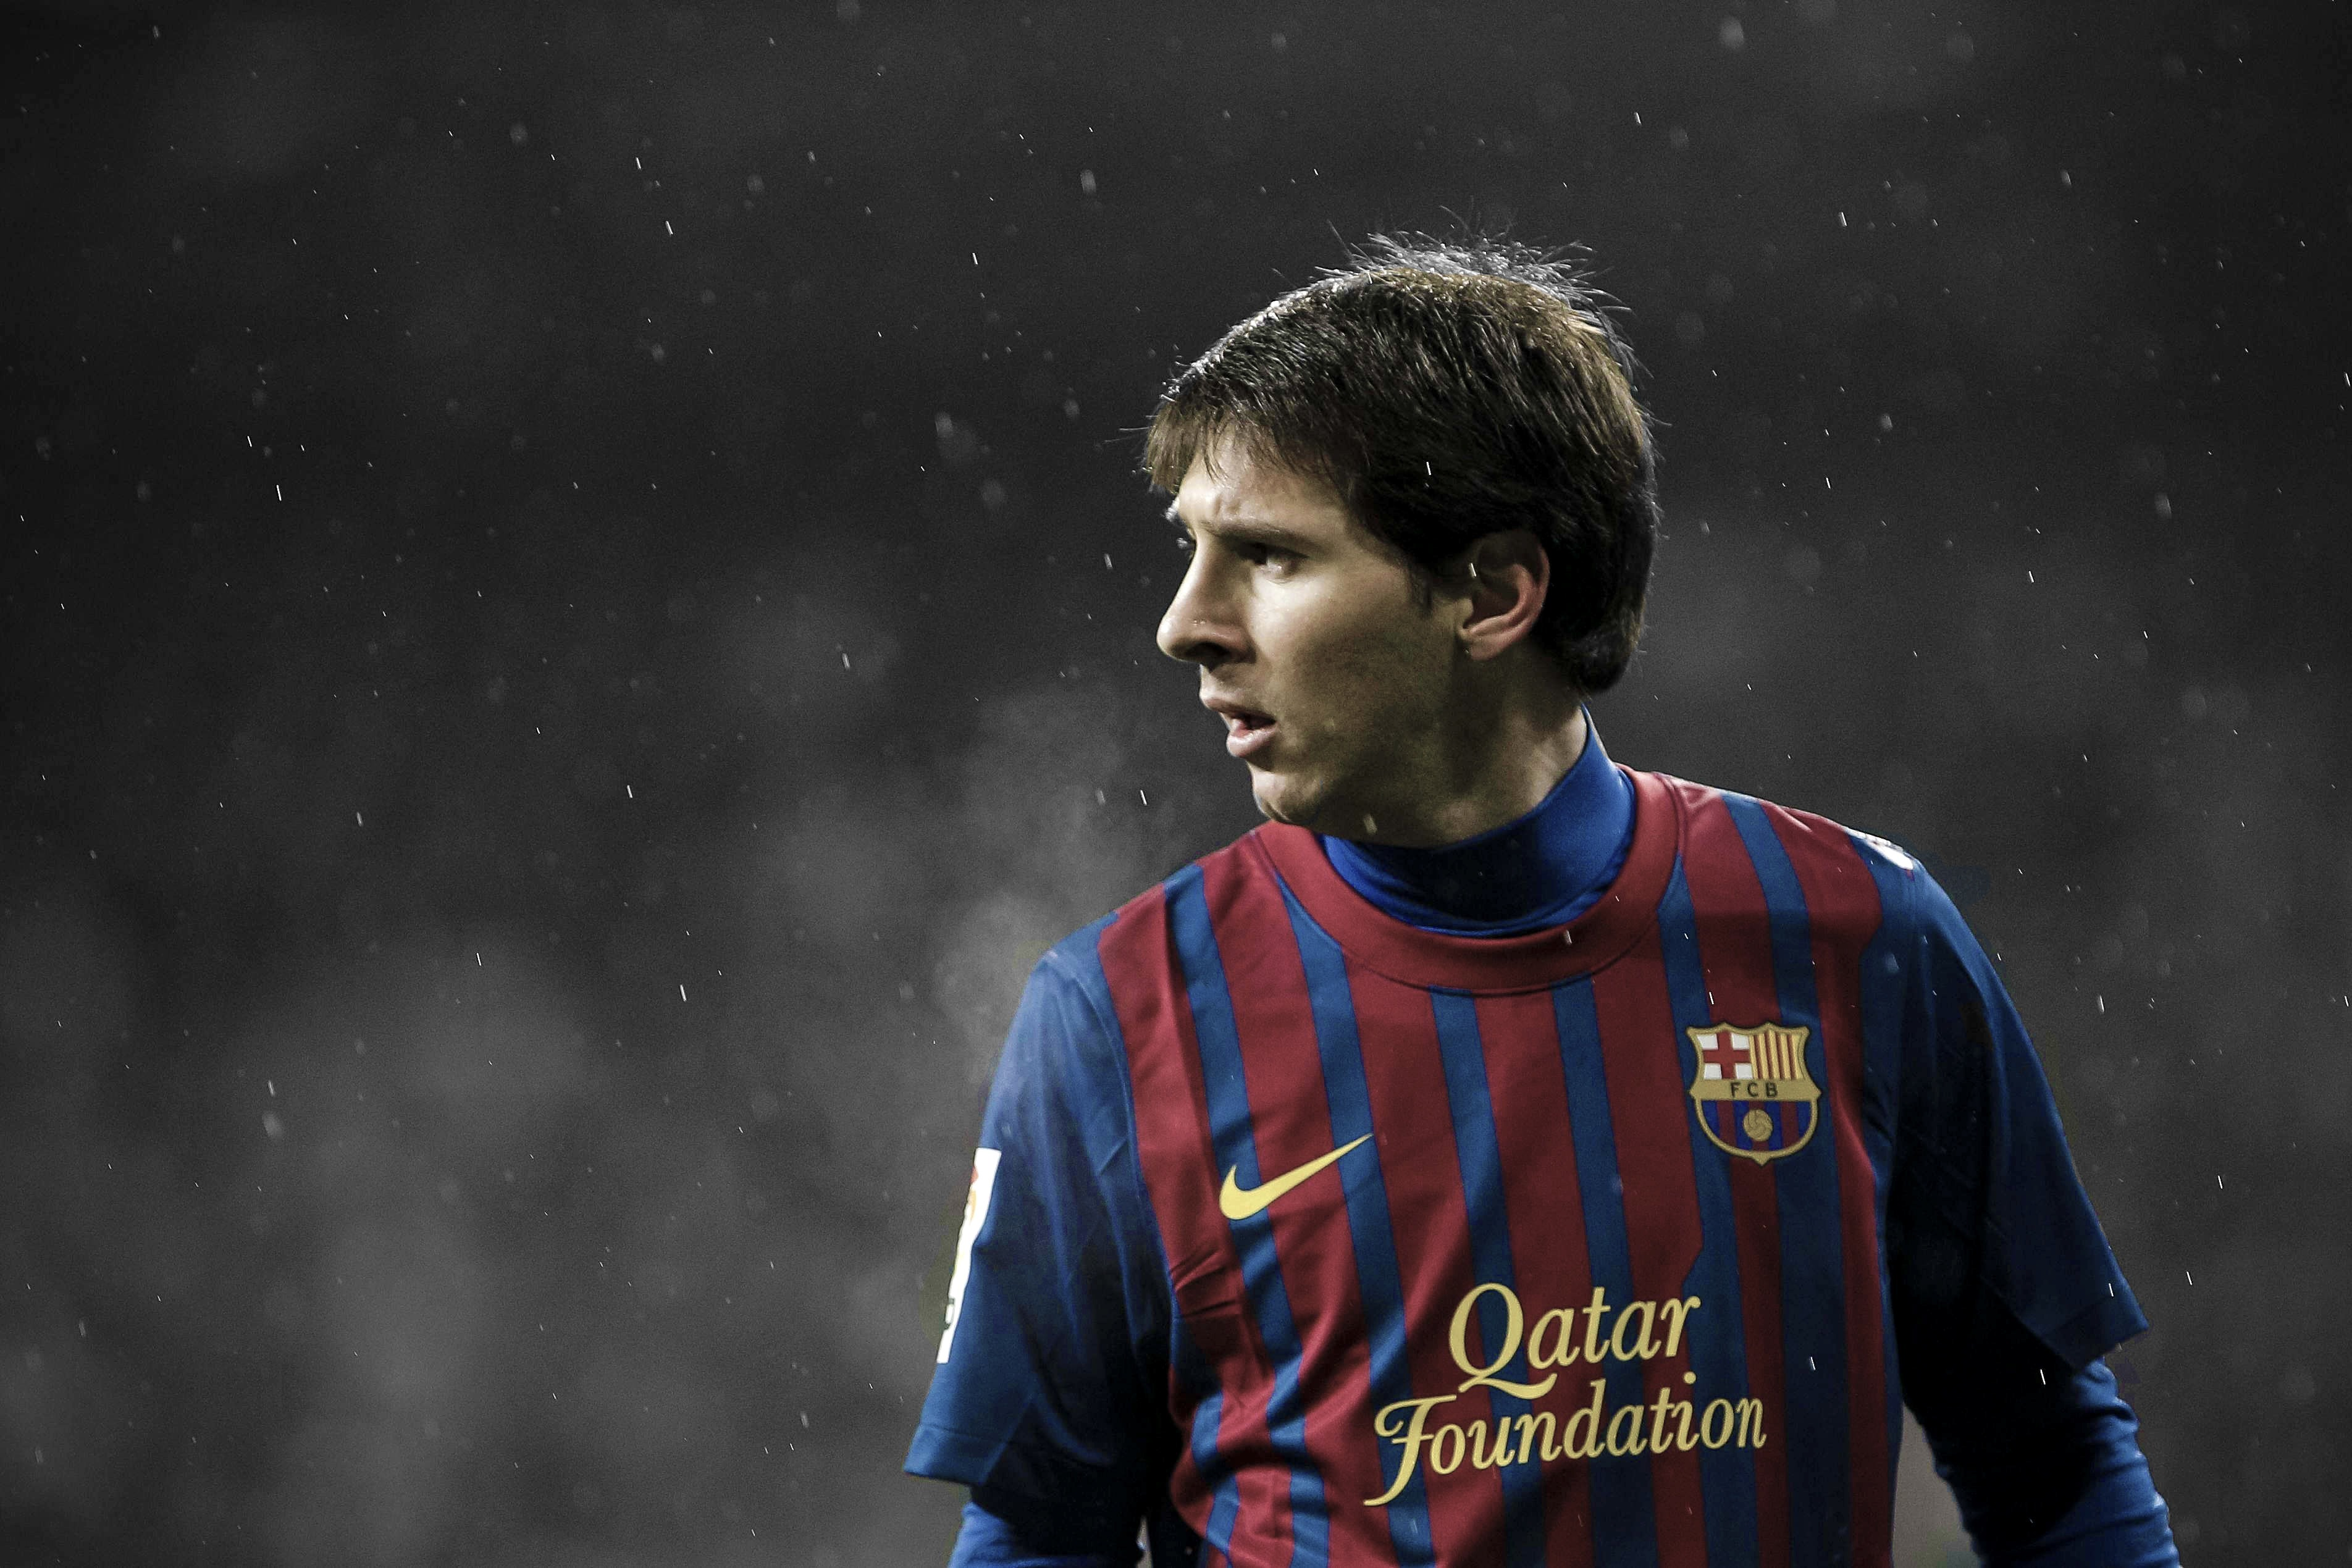 lionel-messi-barcelona---football-3808x2539